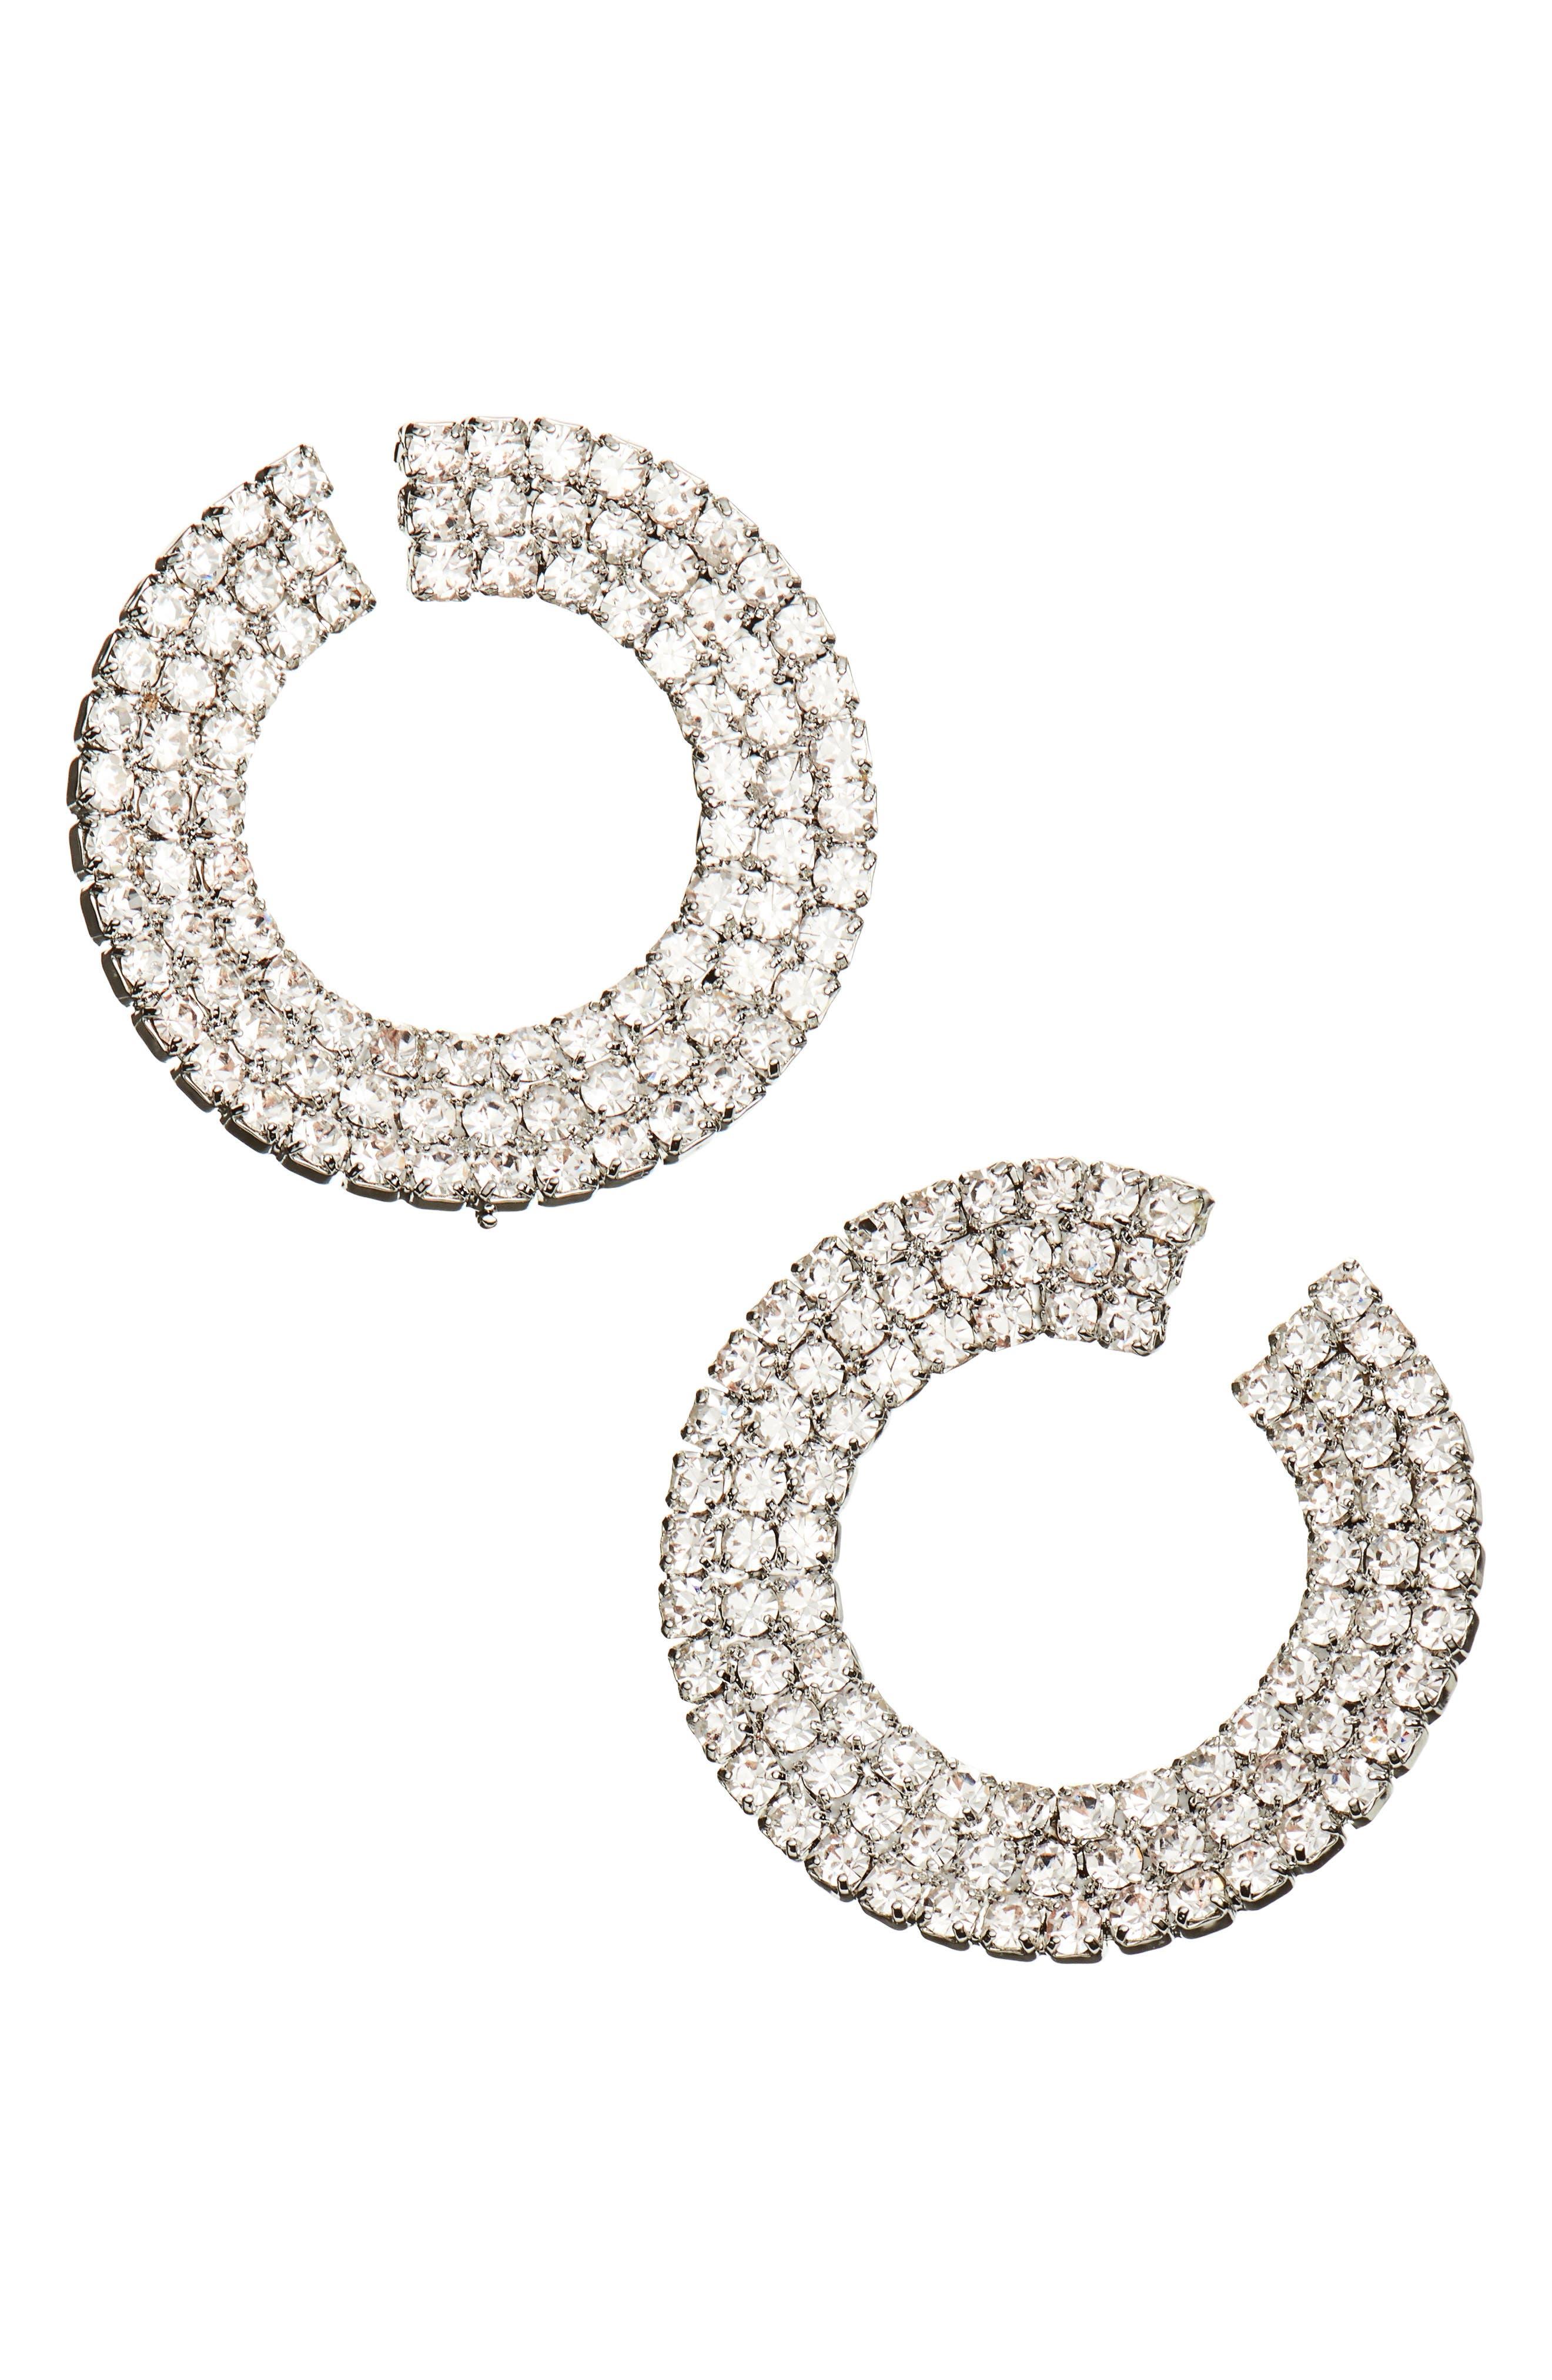 Ring Post Earrings